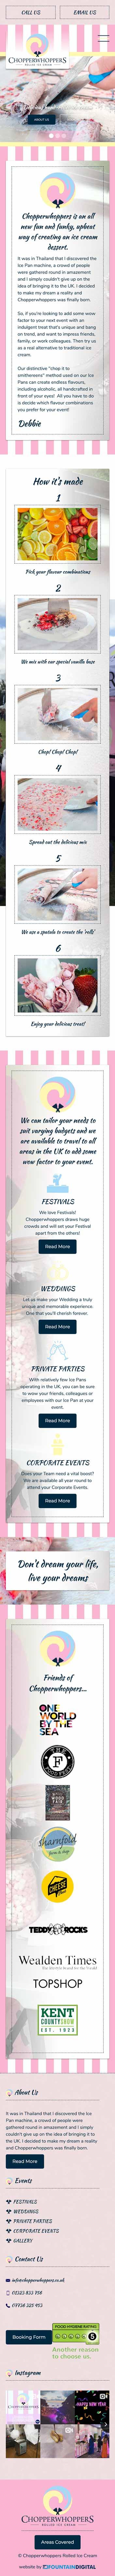 phone image of website design